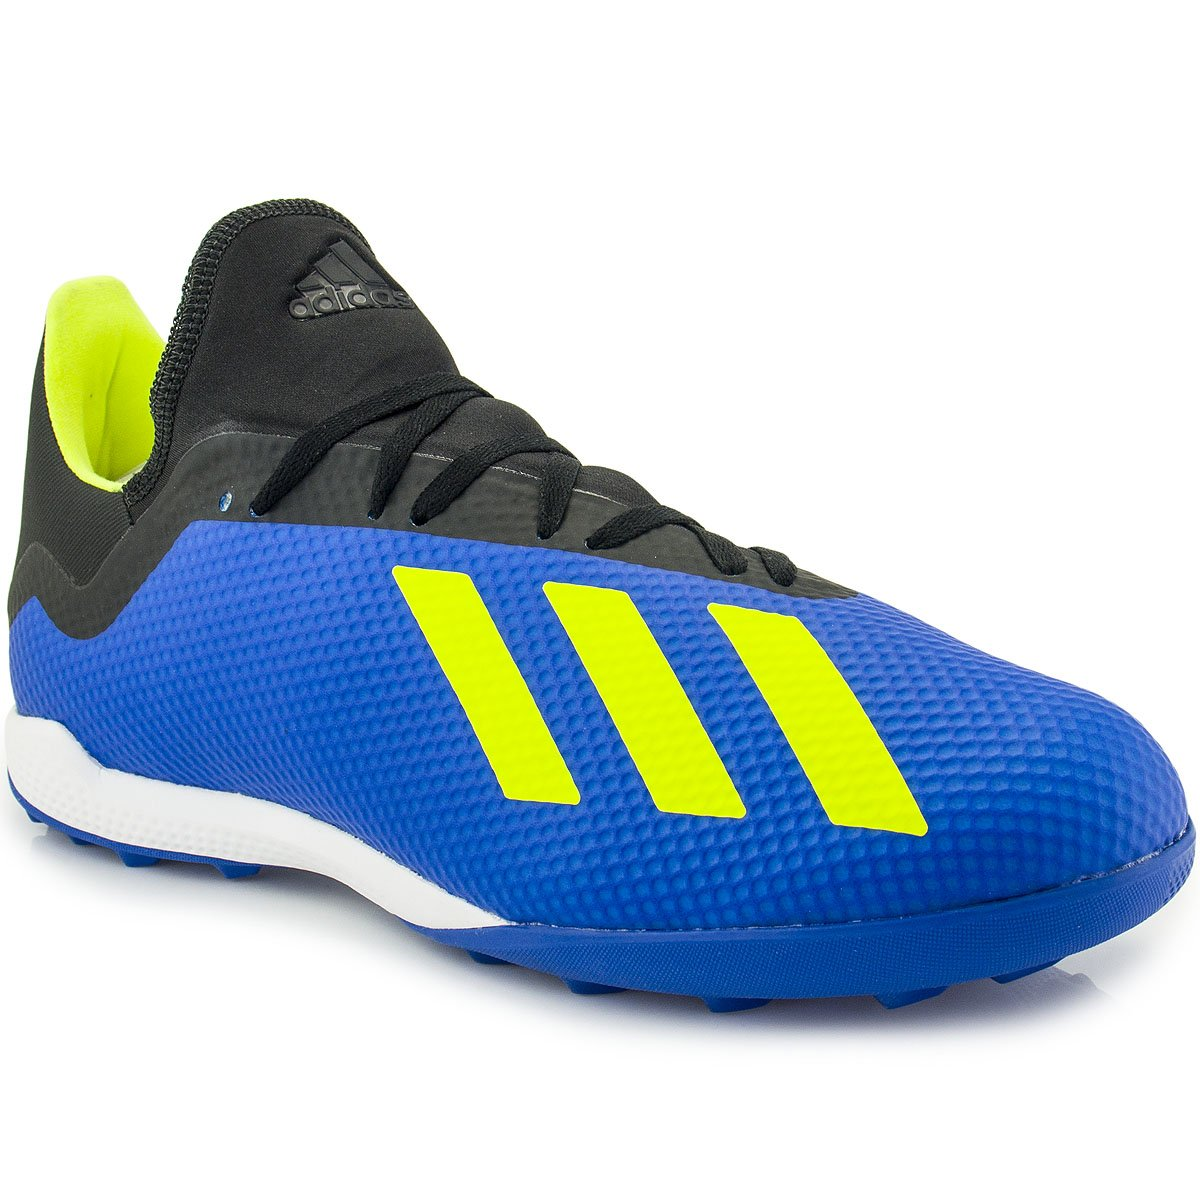 Chuteira Adidas X Tango 18.3 TF  e665176ca2246